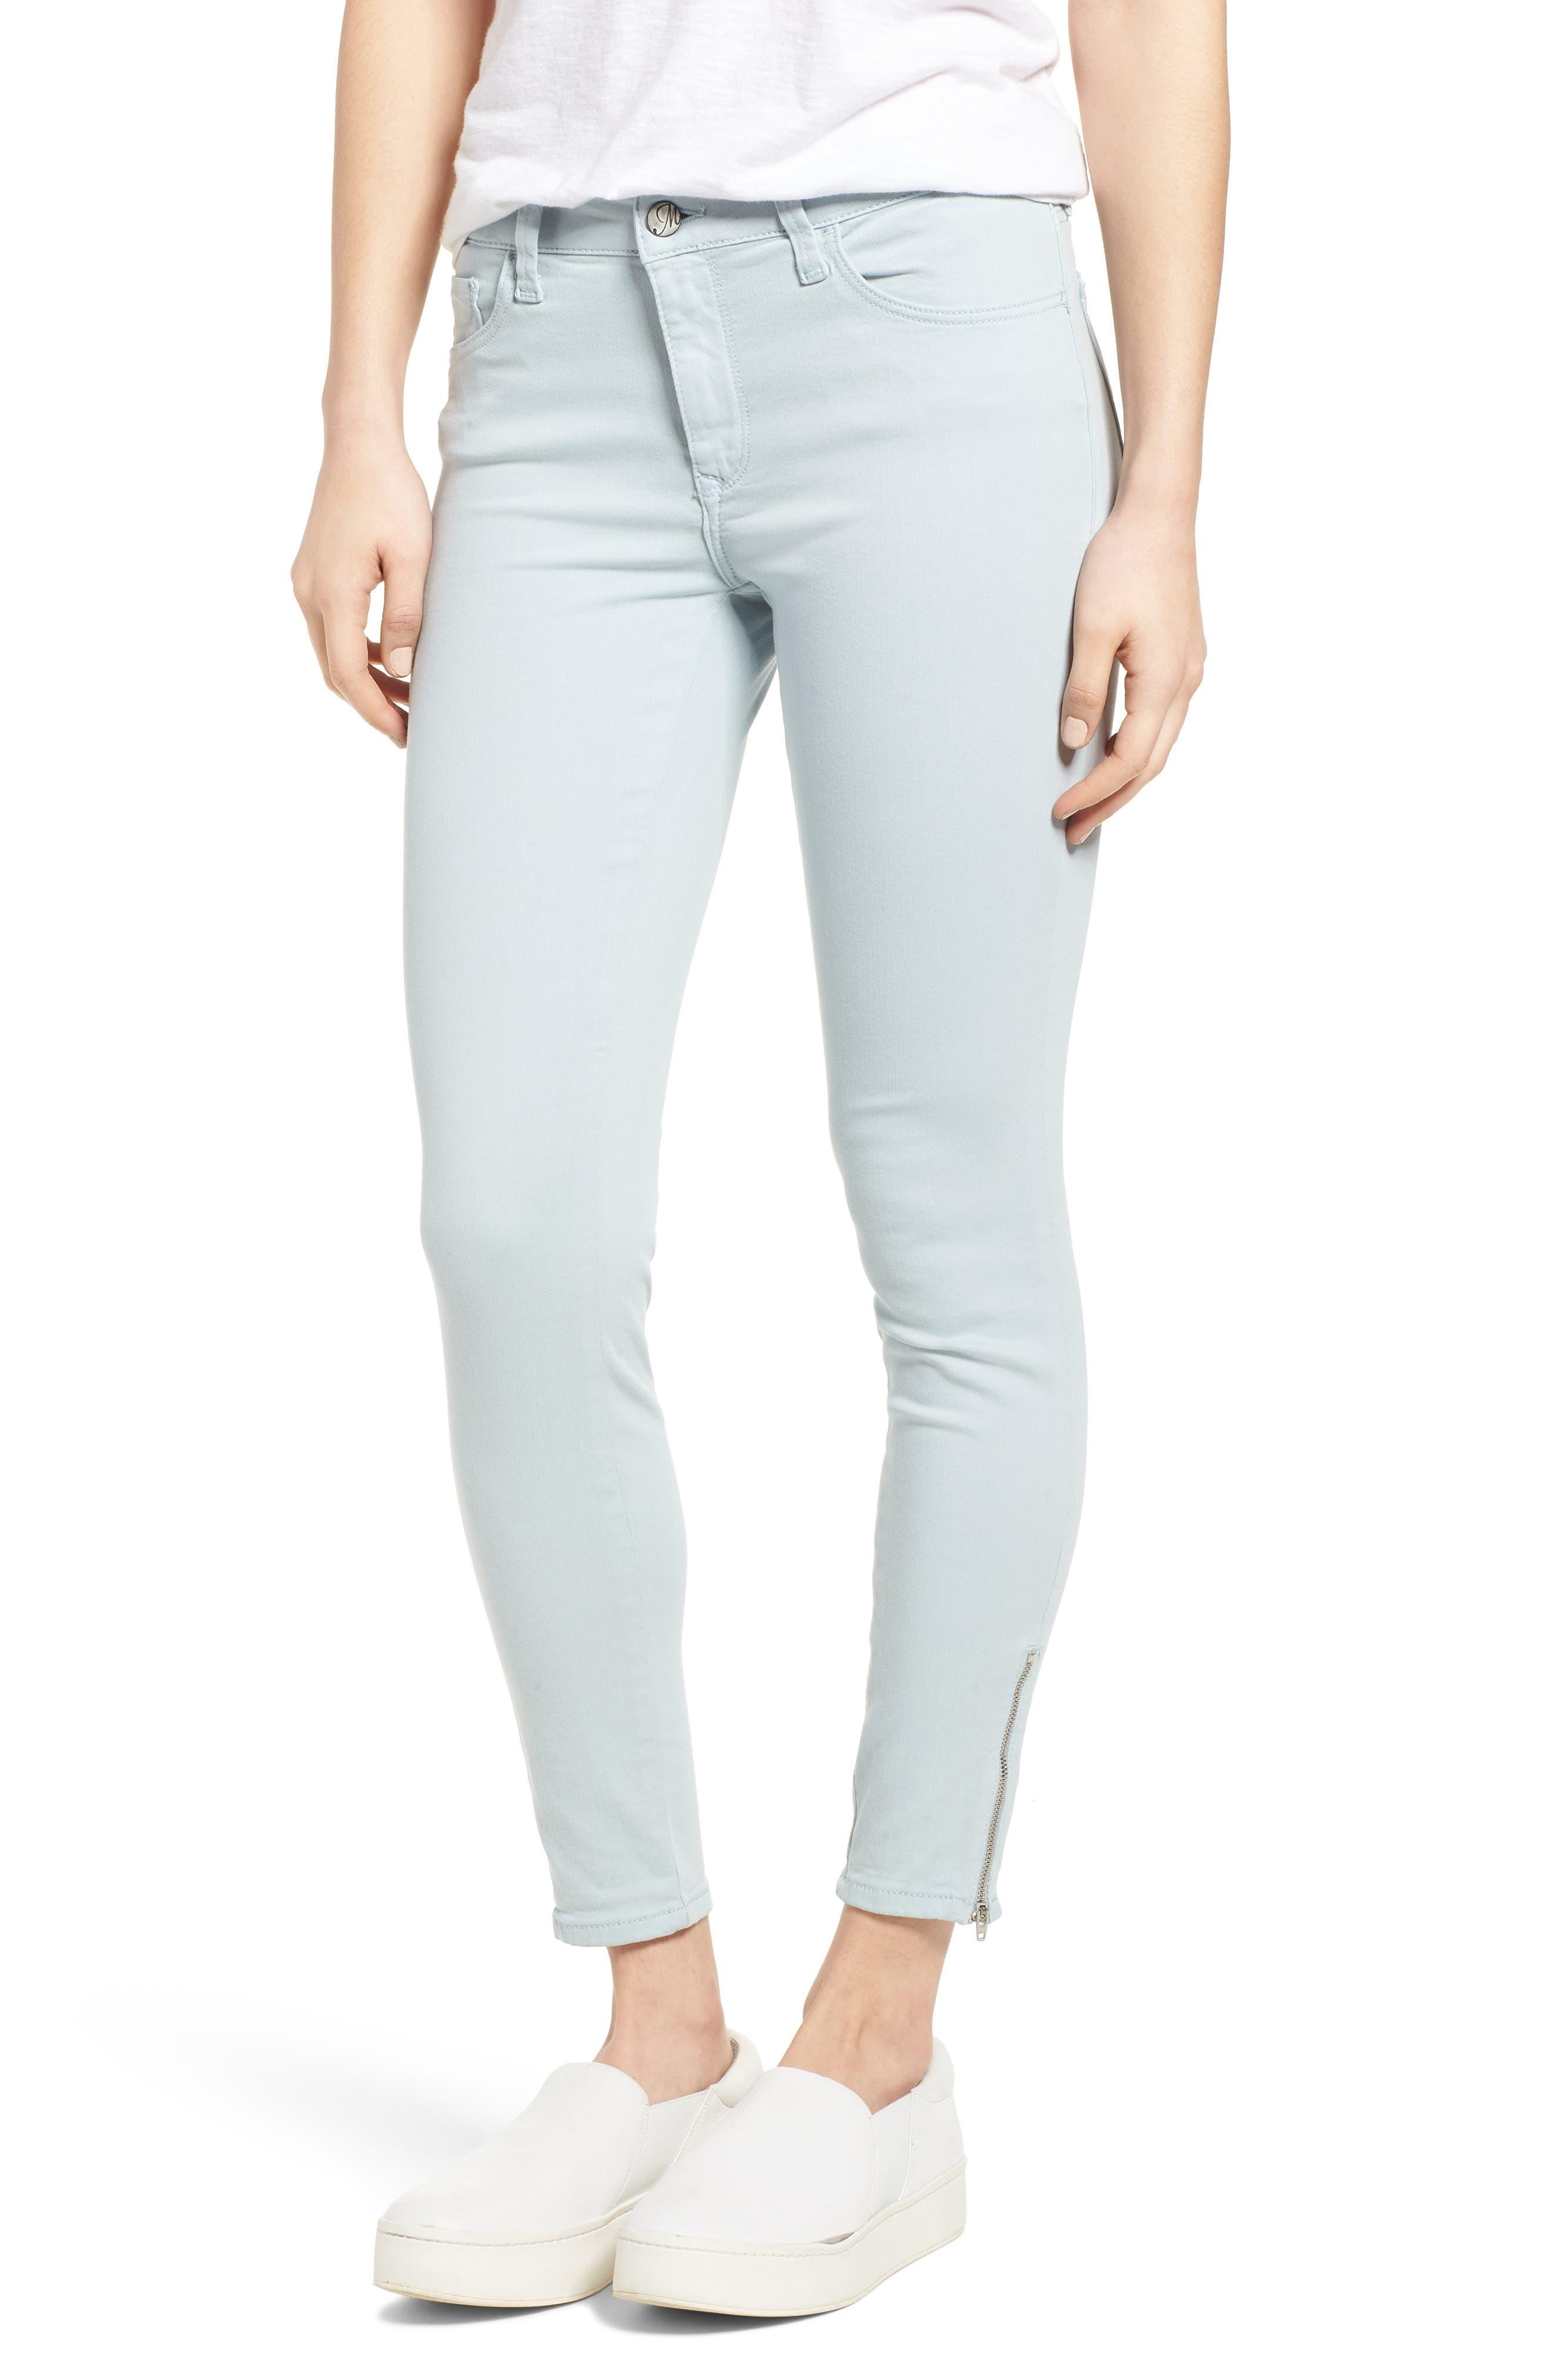 Mavi Jeans ADRIANA ZIP ANKLE SUPER SKINNY JEANS